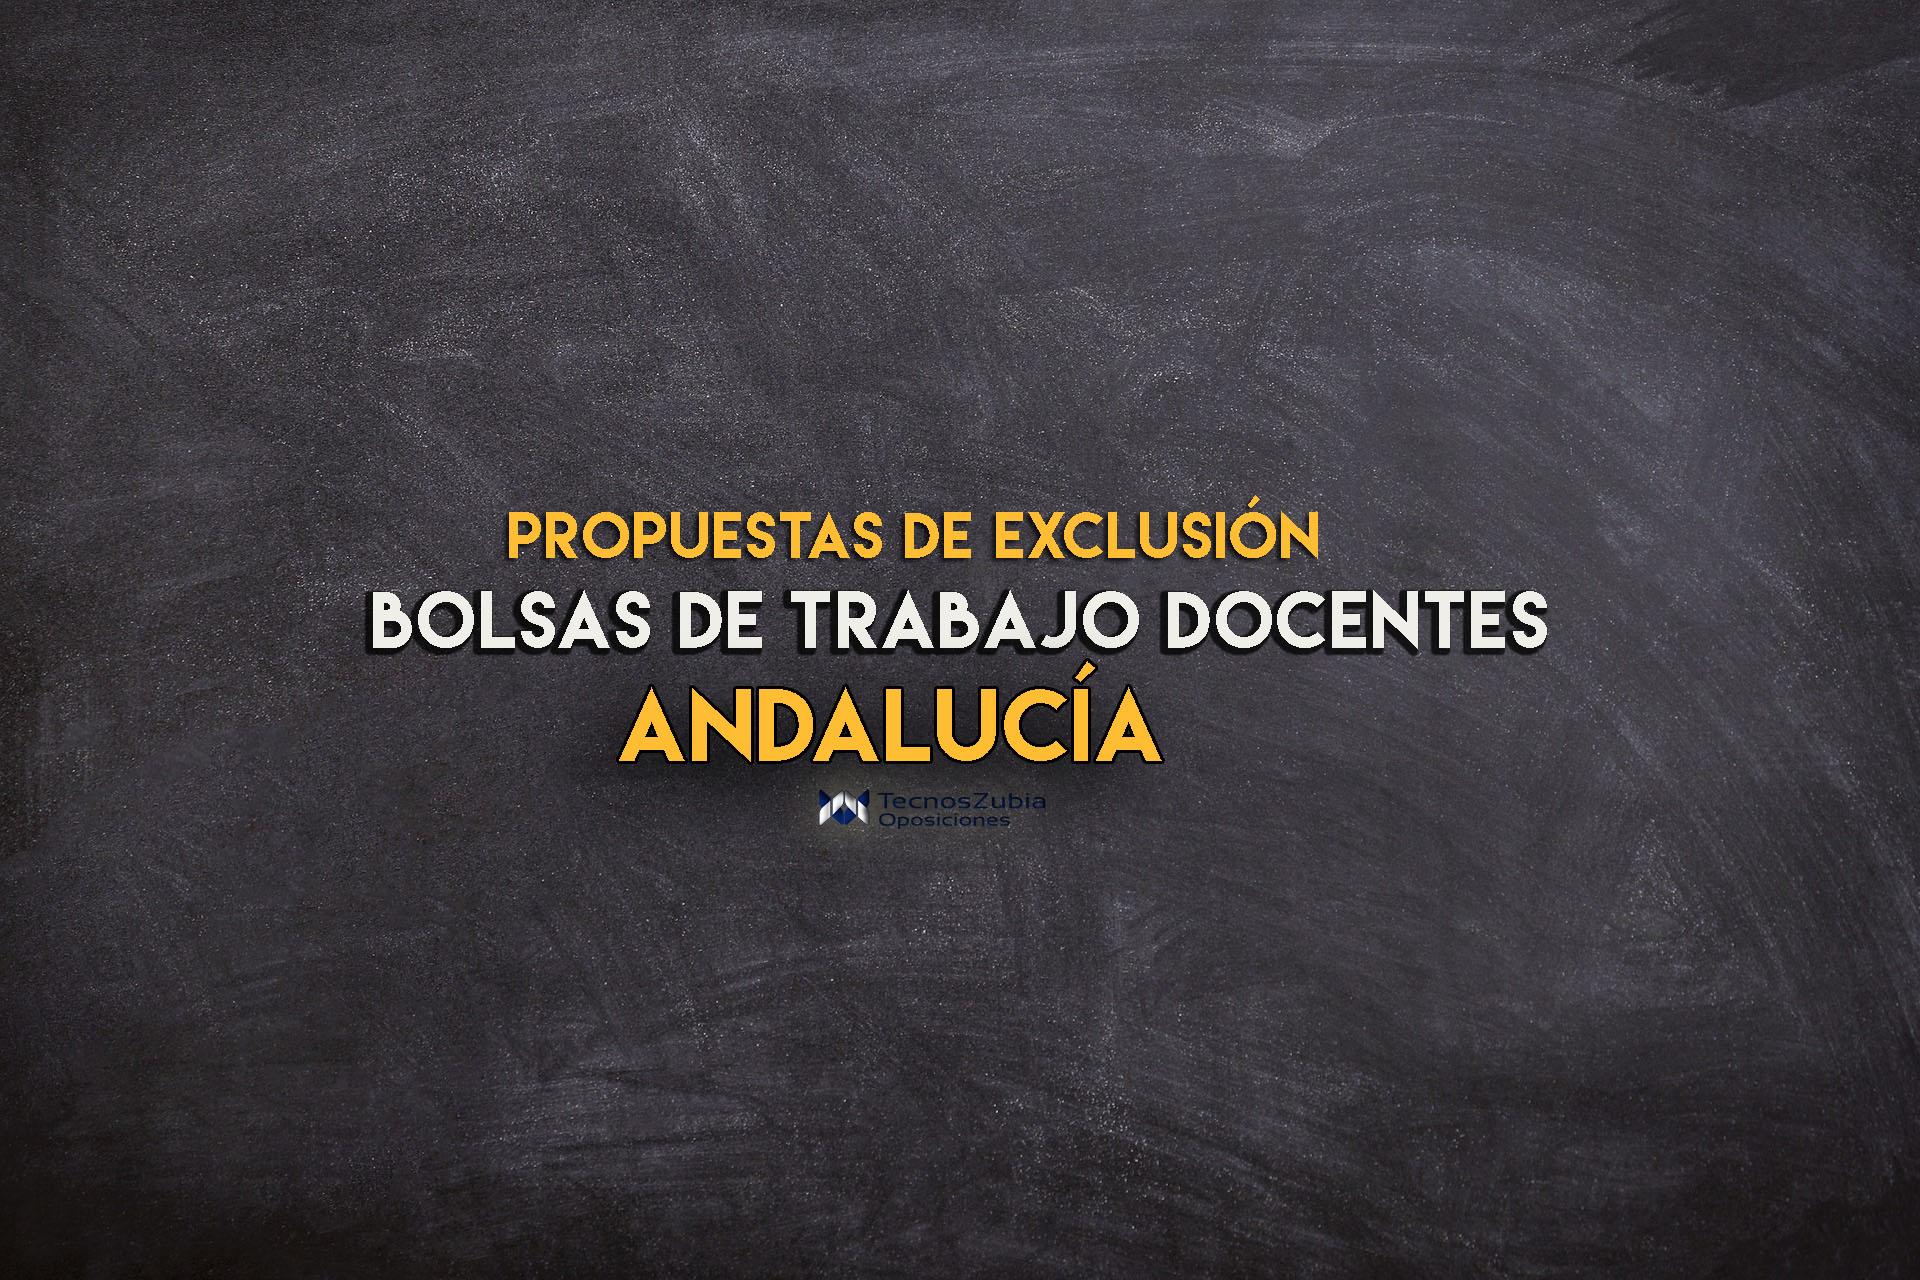 listado de excluidos bolsas de trabajo docentes Andalucia